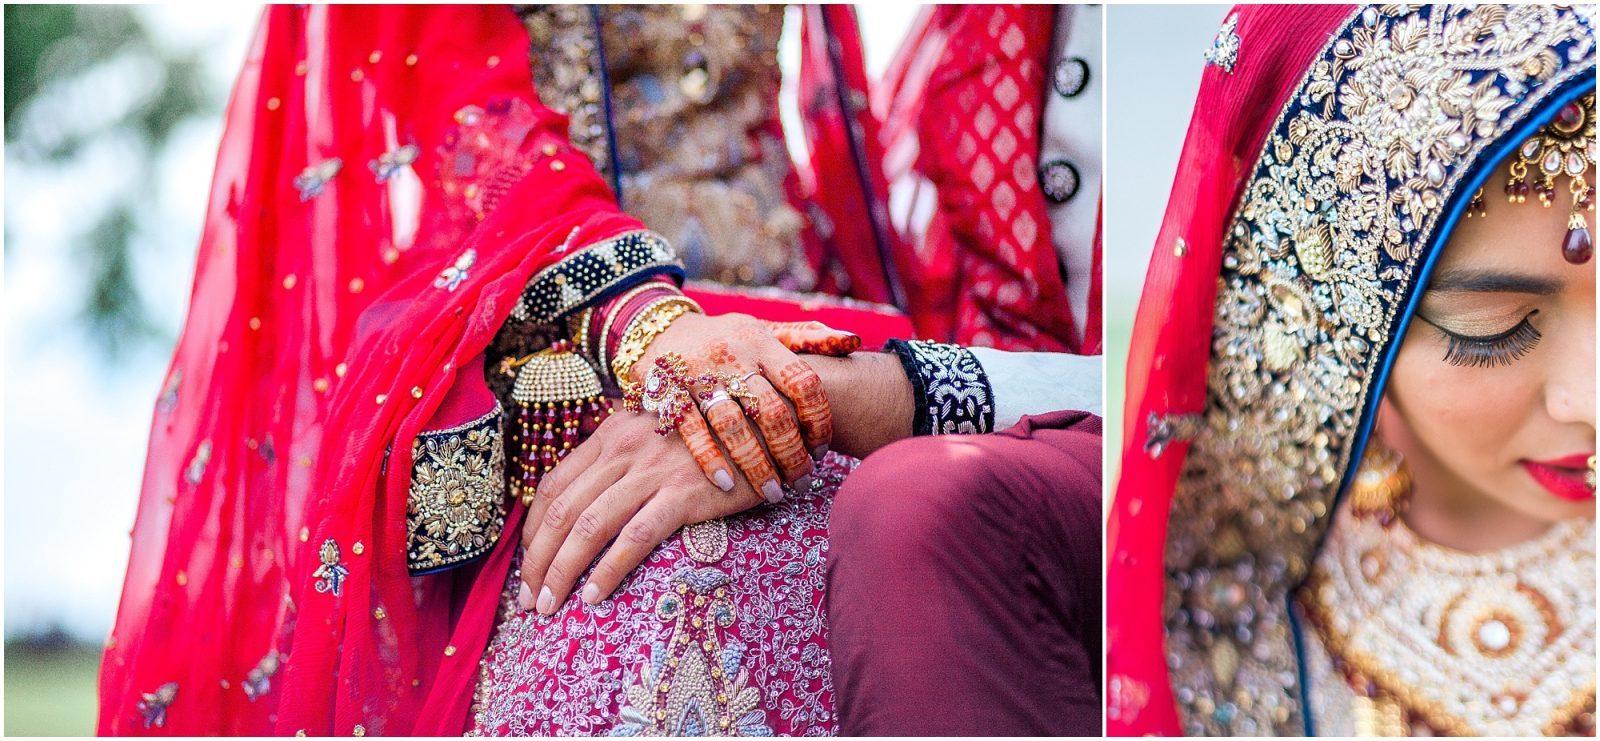 South Asian Wedding Toronto Photography - Mehndi, Nikah, walima, indian wedding, pakistani wedding. Sarah & Sajid - holding hands